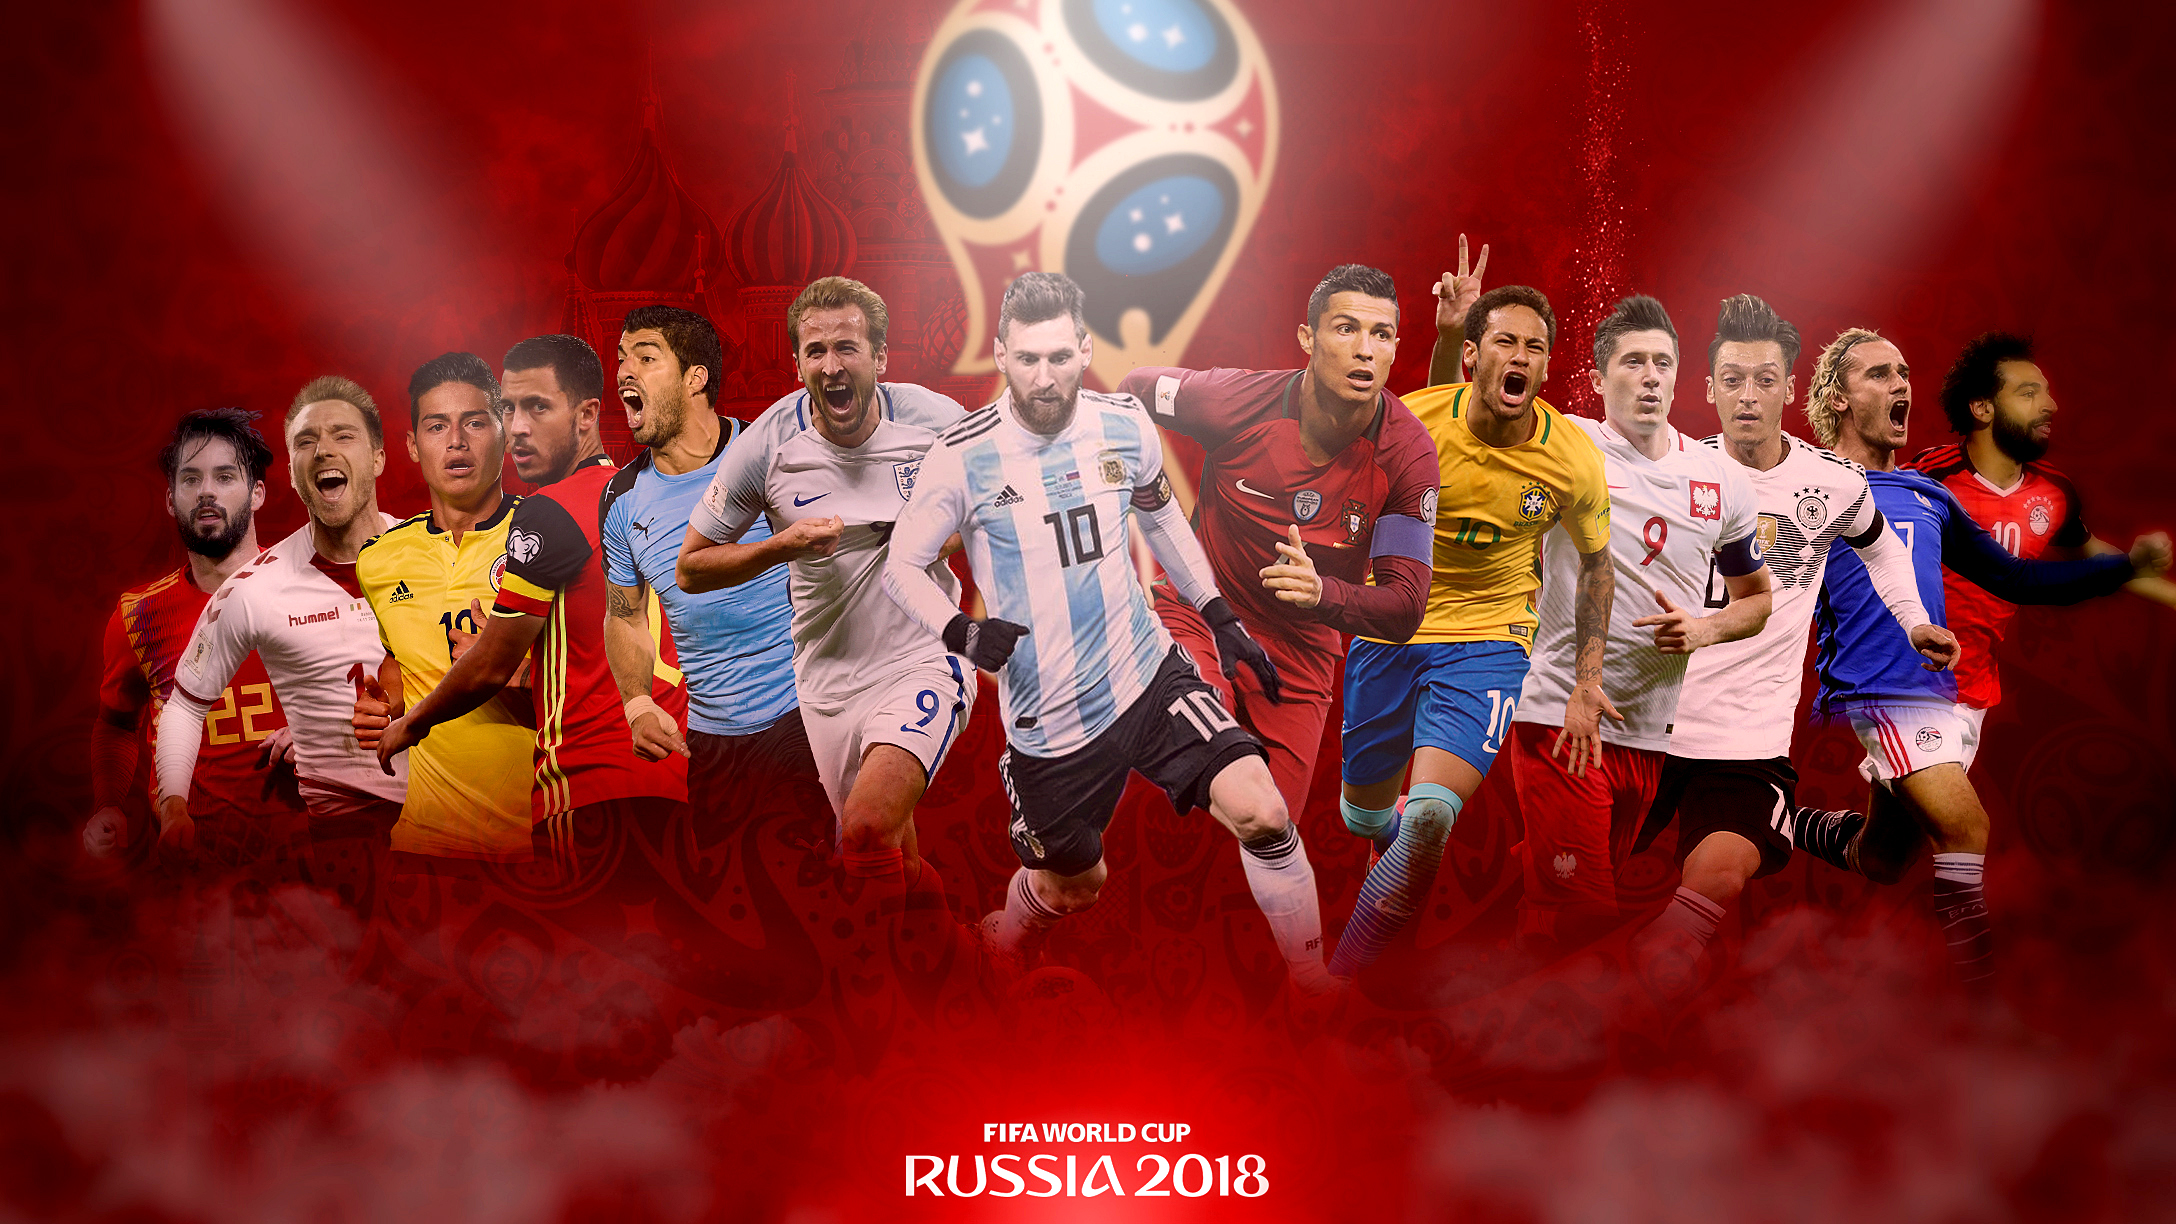 Fifa World Cup 2018 Players Wallpaper El Mundo Boston